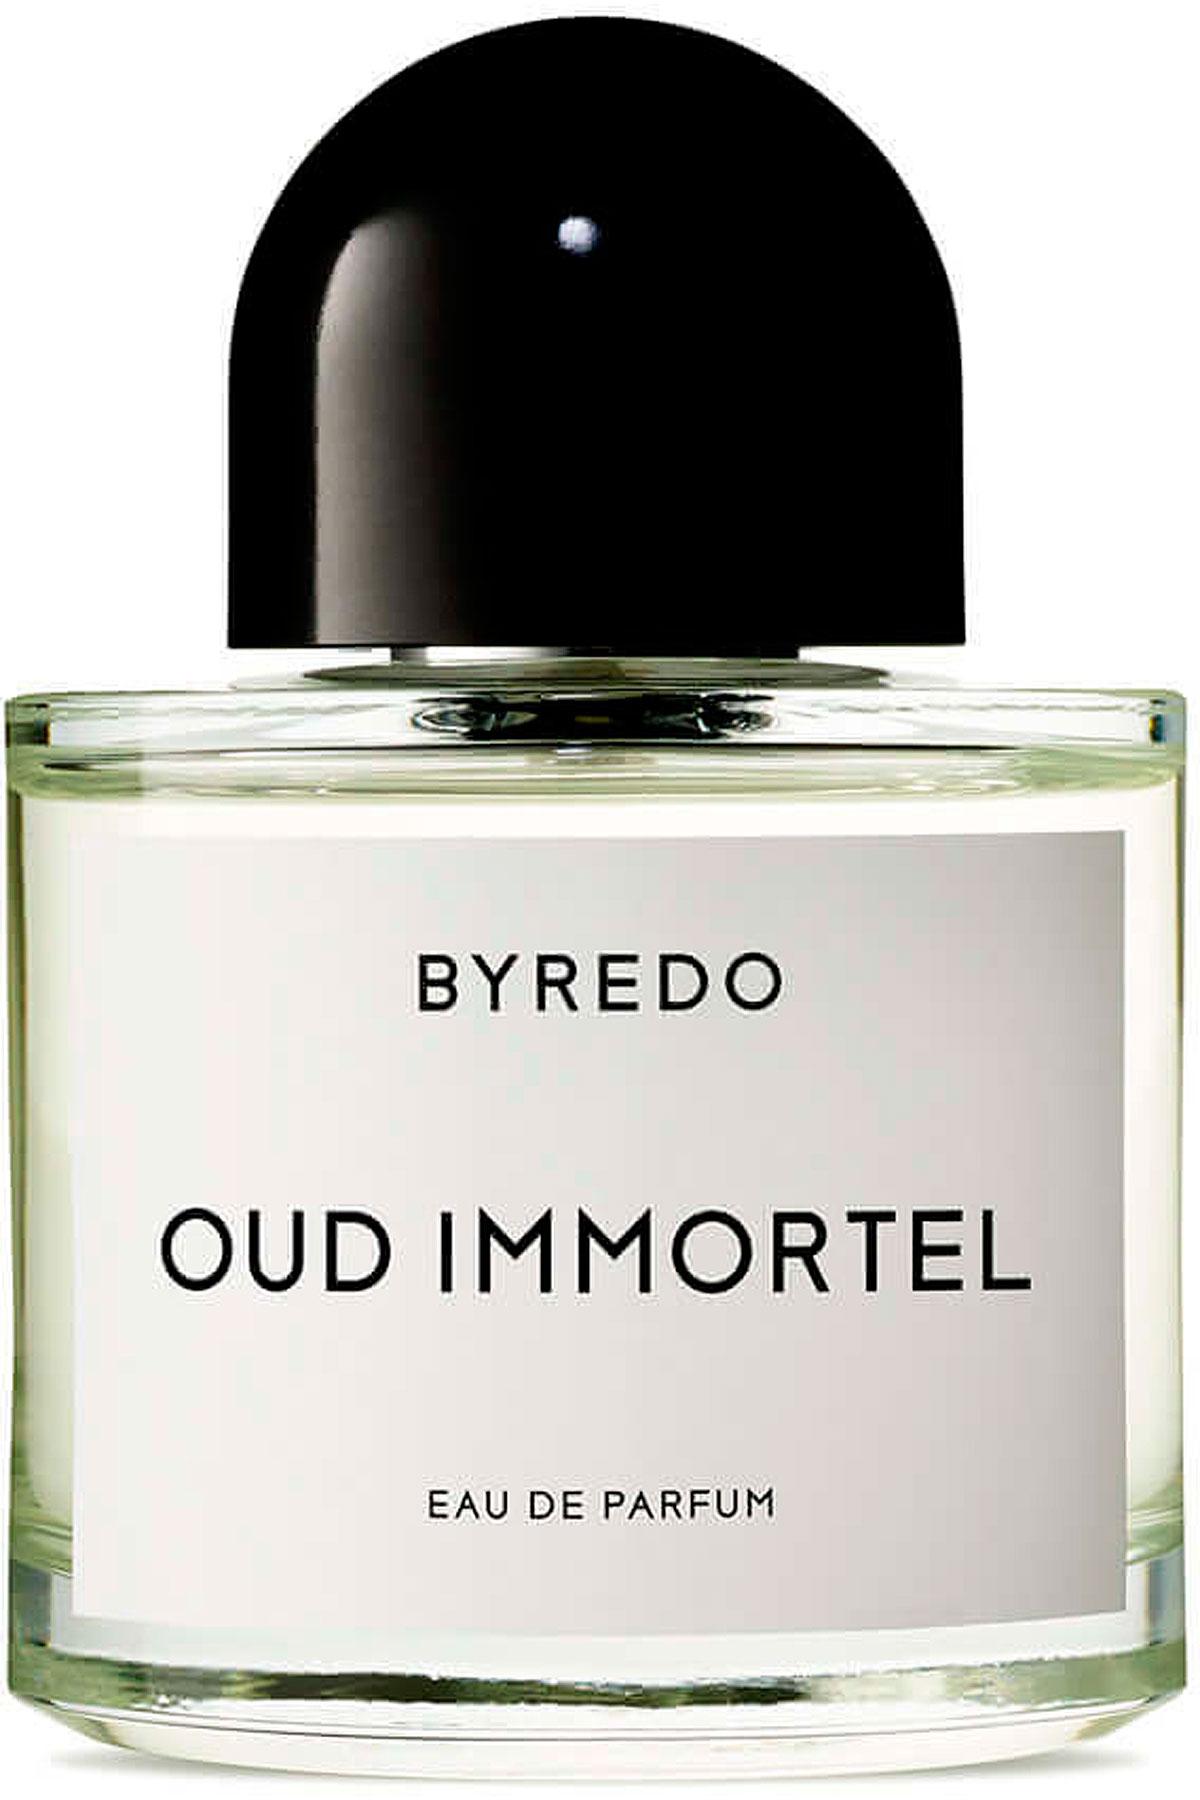 Byredo Fragrances for Women On Sale, Oud Immortel - Eau De Parfum - 100 Ml, 2019, 100 ml